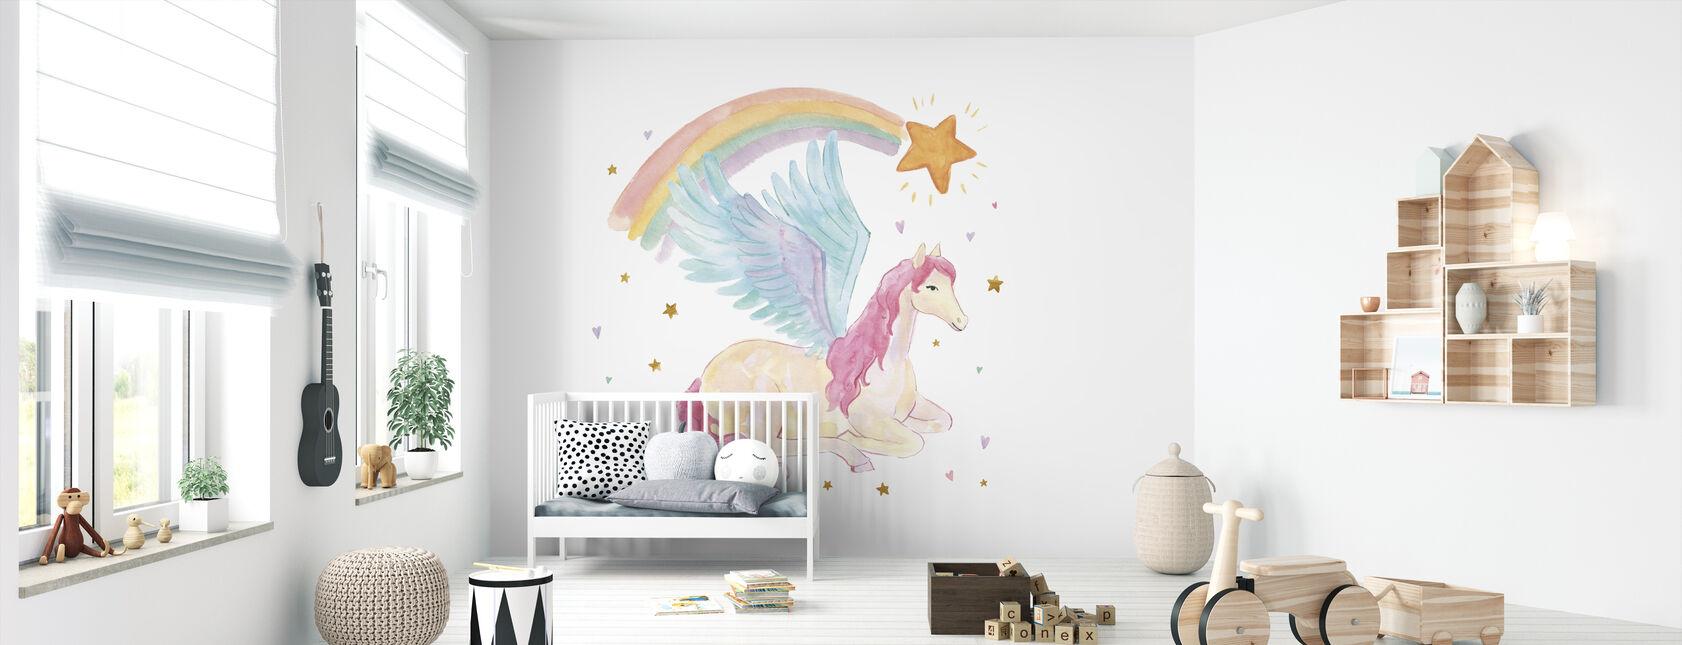 Magical Friends II - Wallpaper - Nursery